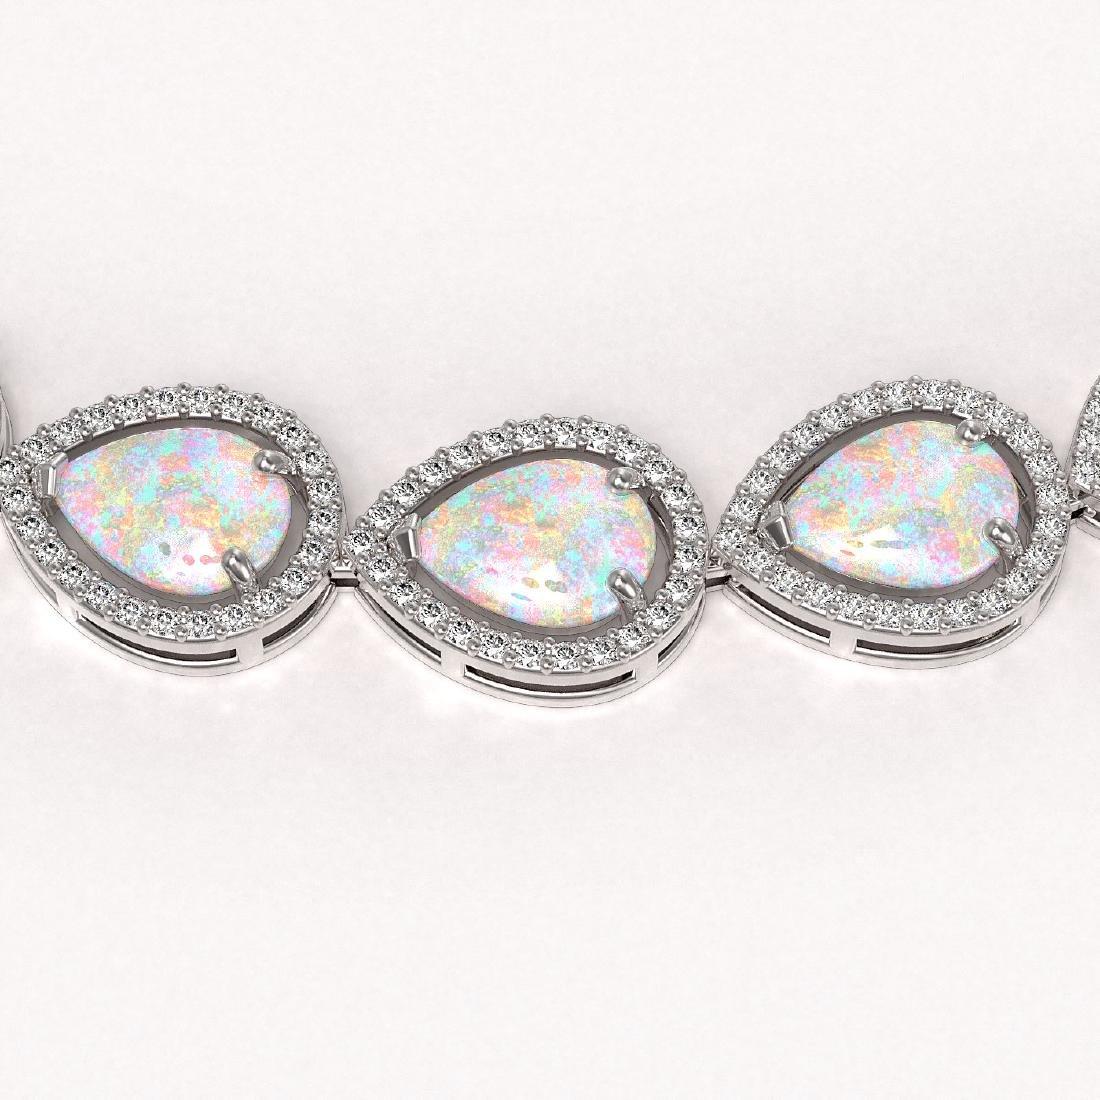 36.48 CTW Opal & Diamond Halo Necklace 10K White Gold - 3